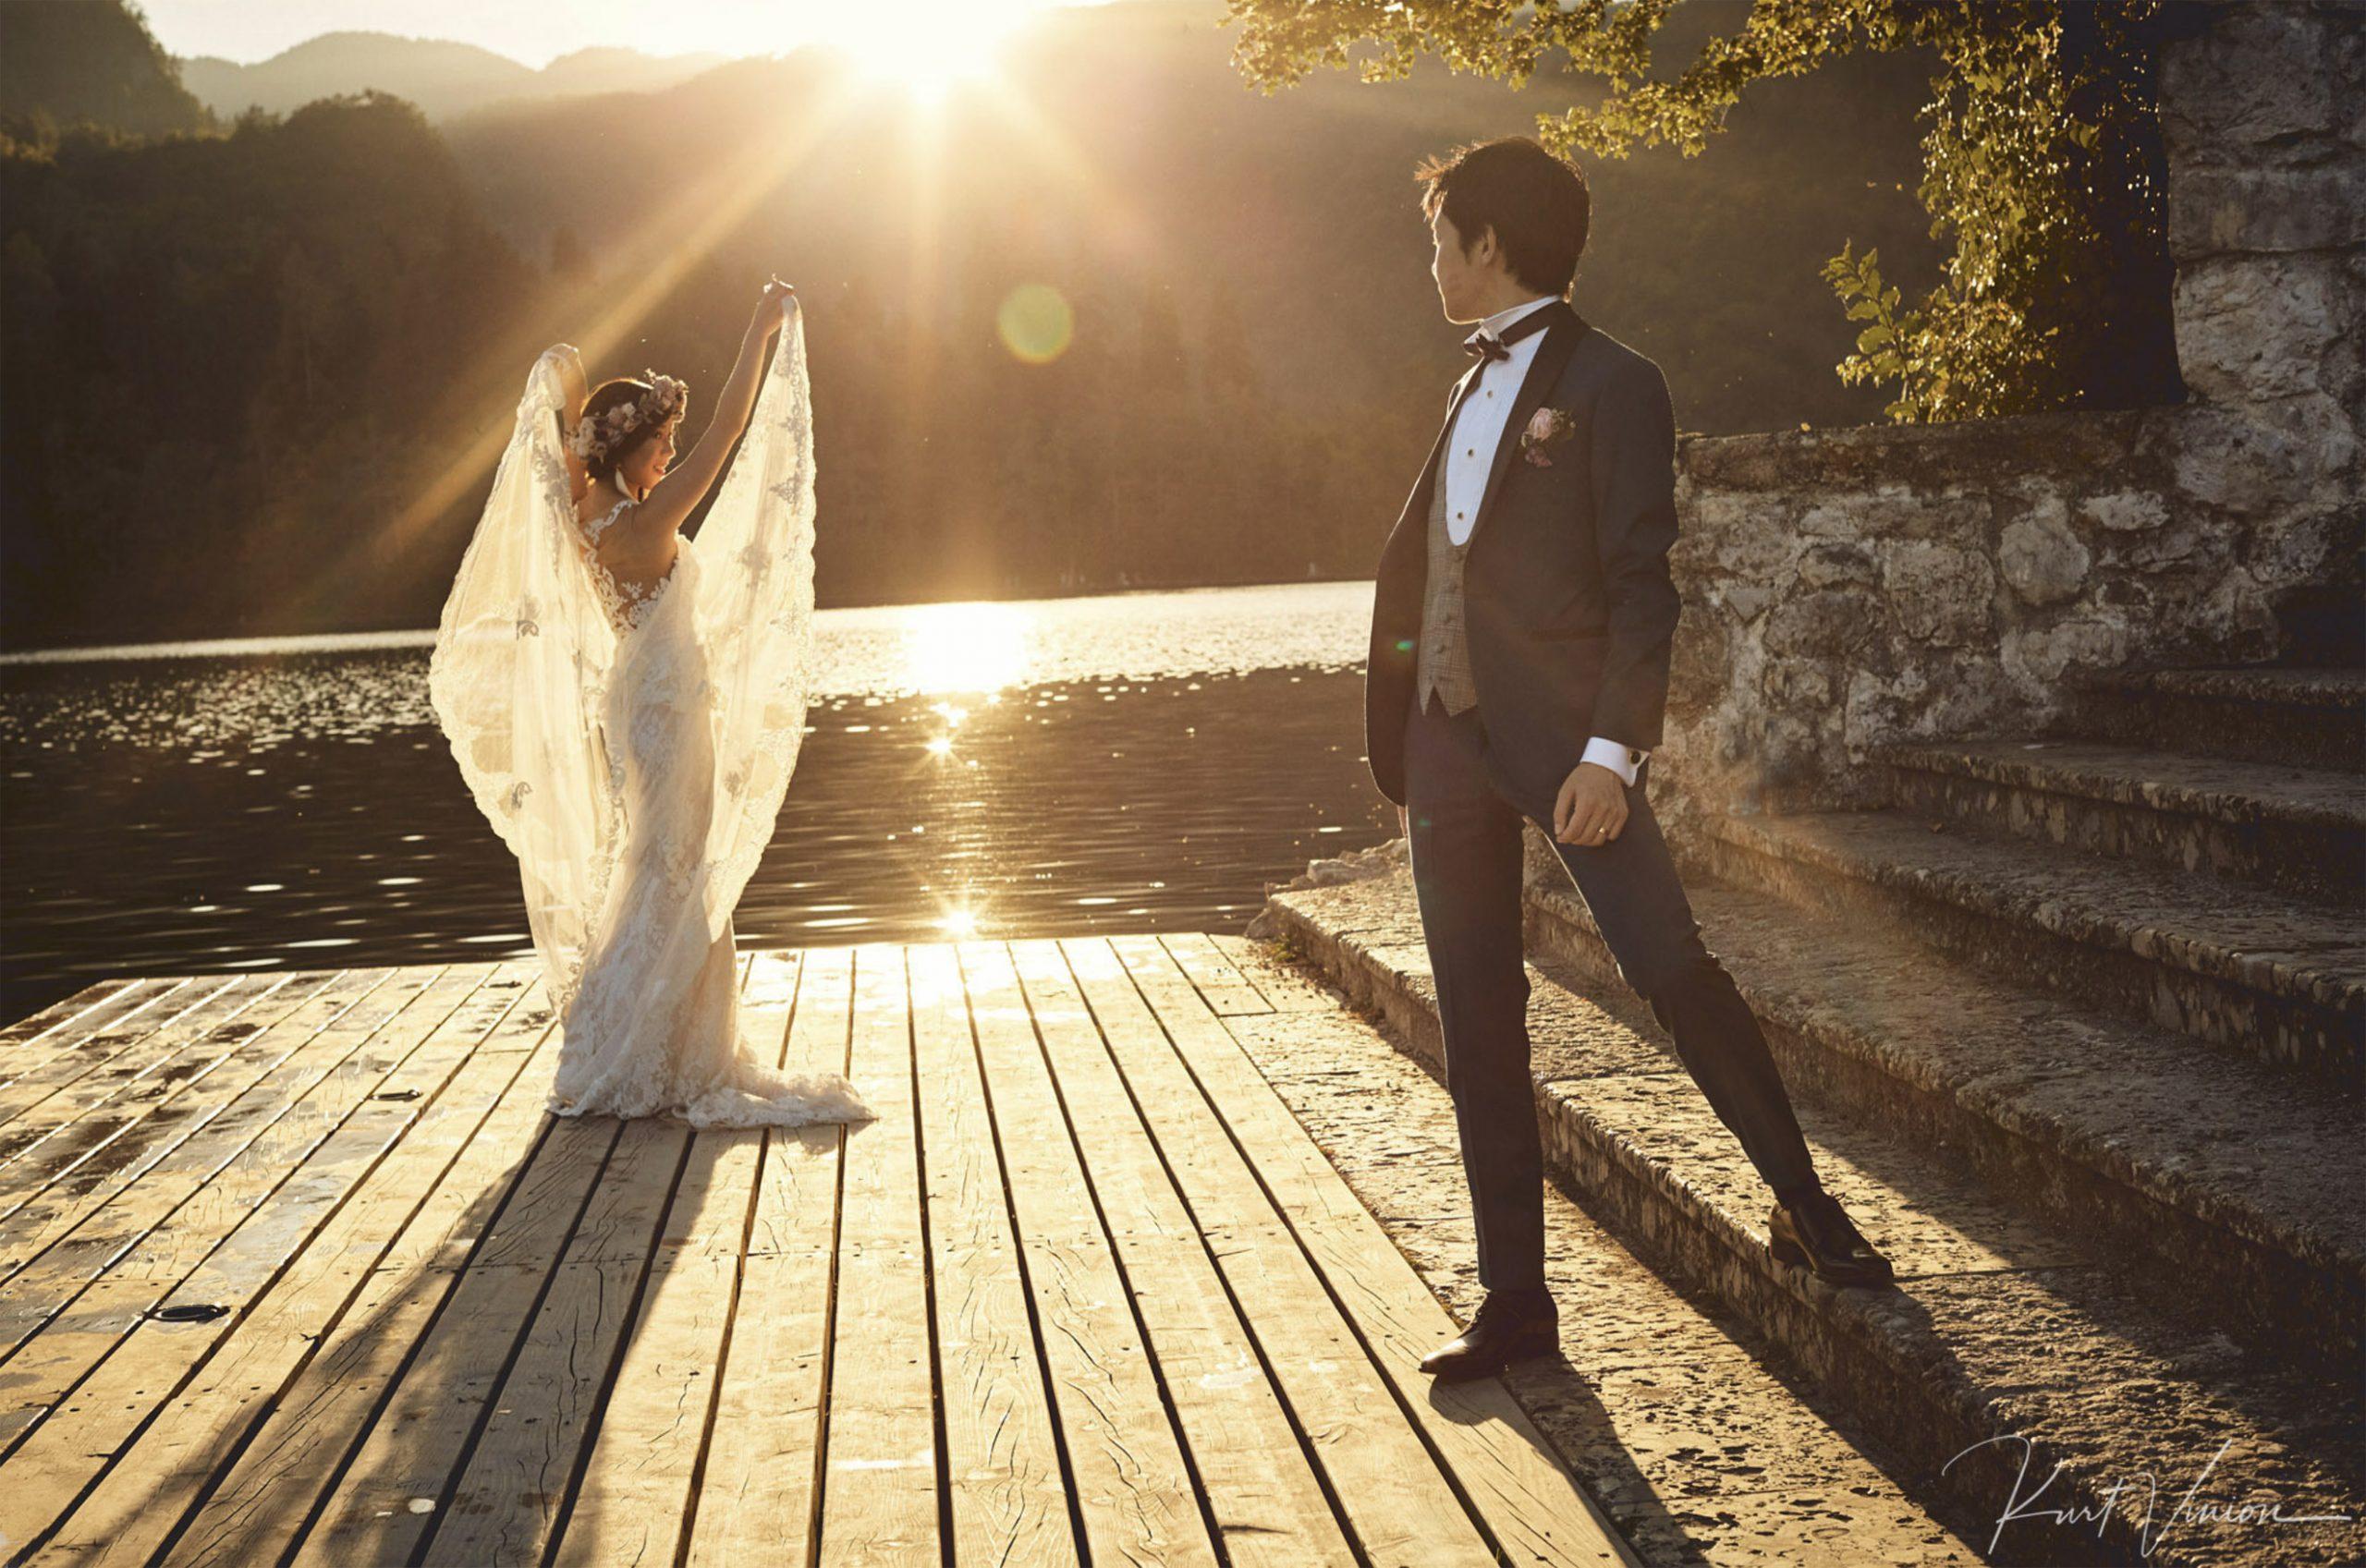 Kurt-Vinion-Wedding-Photographer-Prague-7